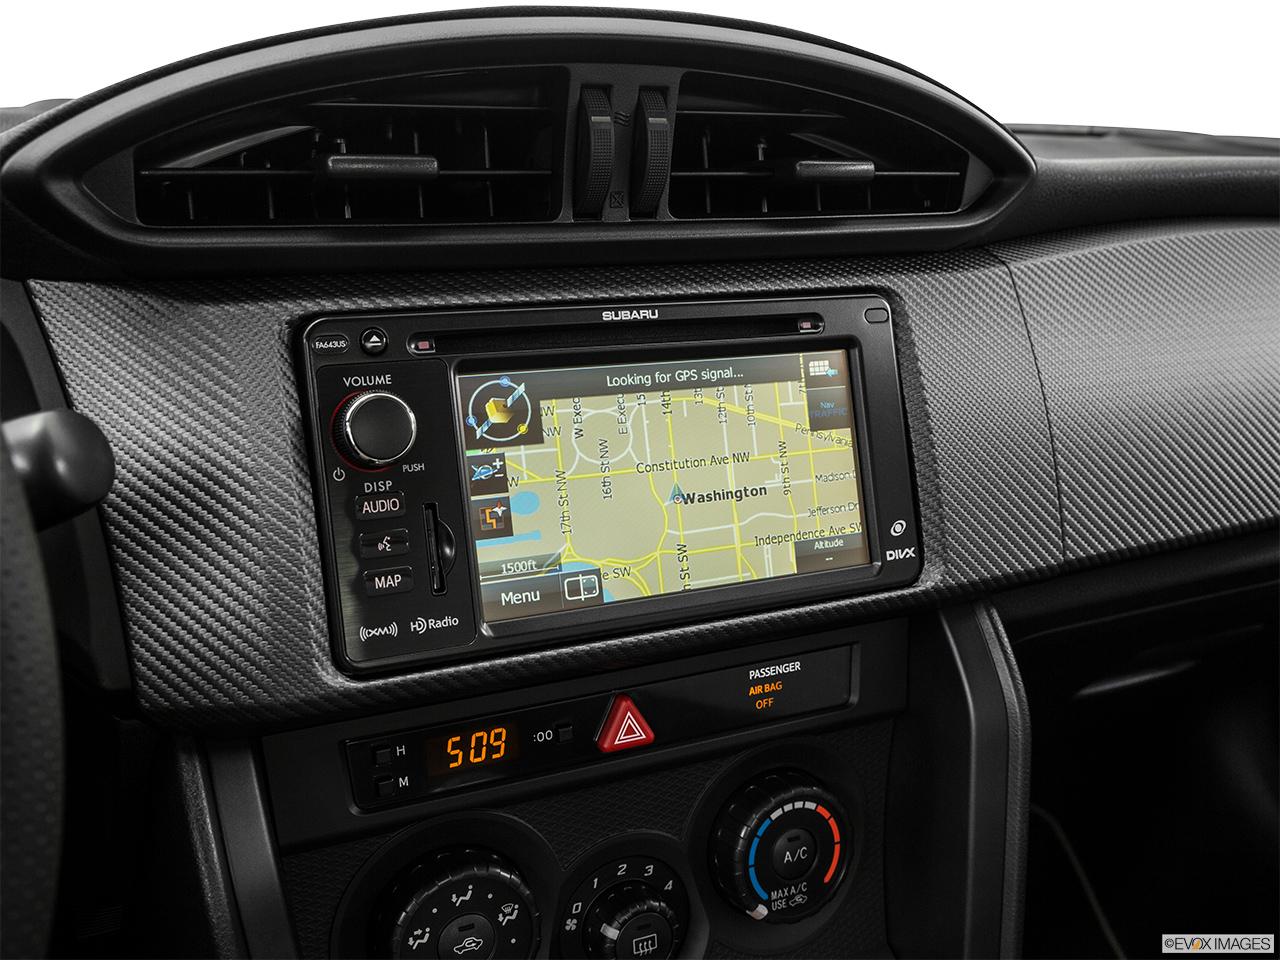 2015 subaru brz manual premium coupe front angle view 2015 rh carnow com 2013 Subaru Legacy Nav Unit Subaru Navigation Update